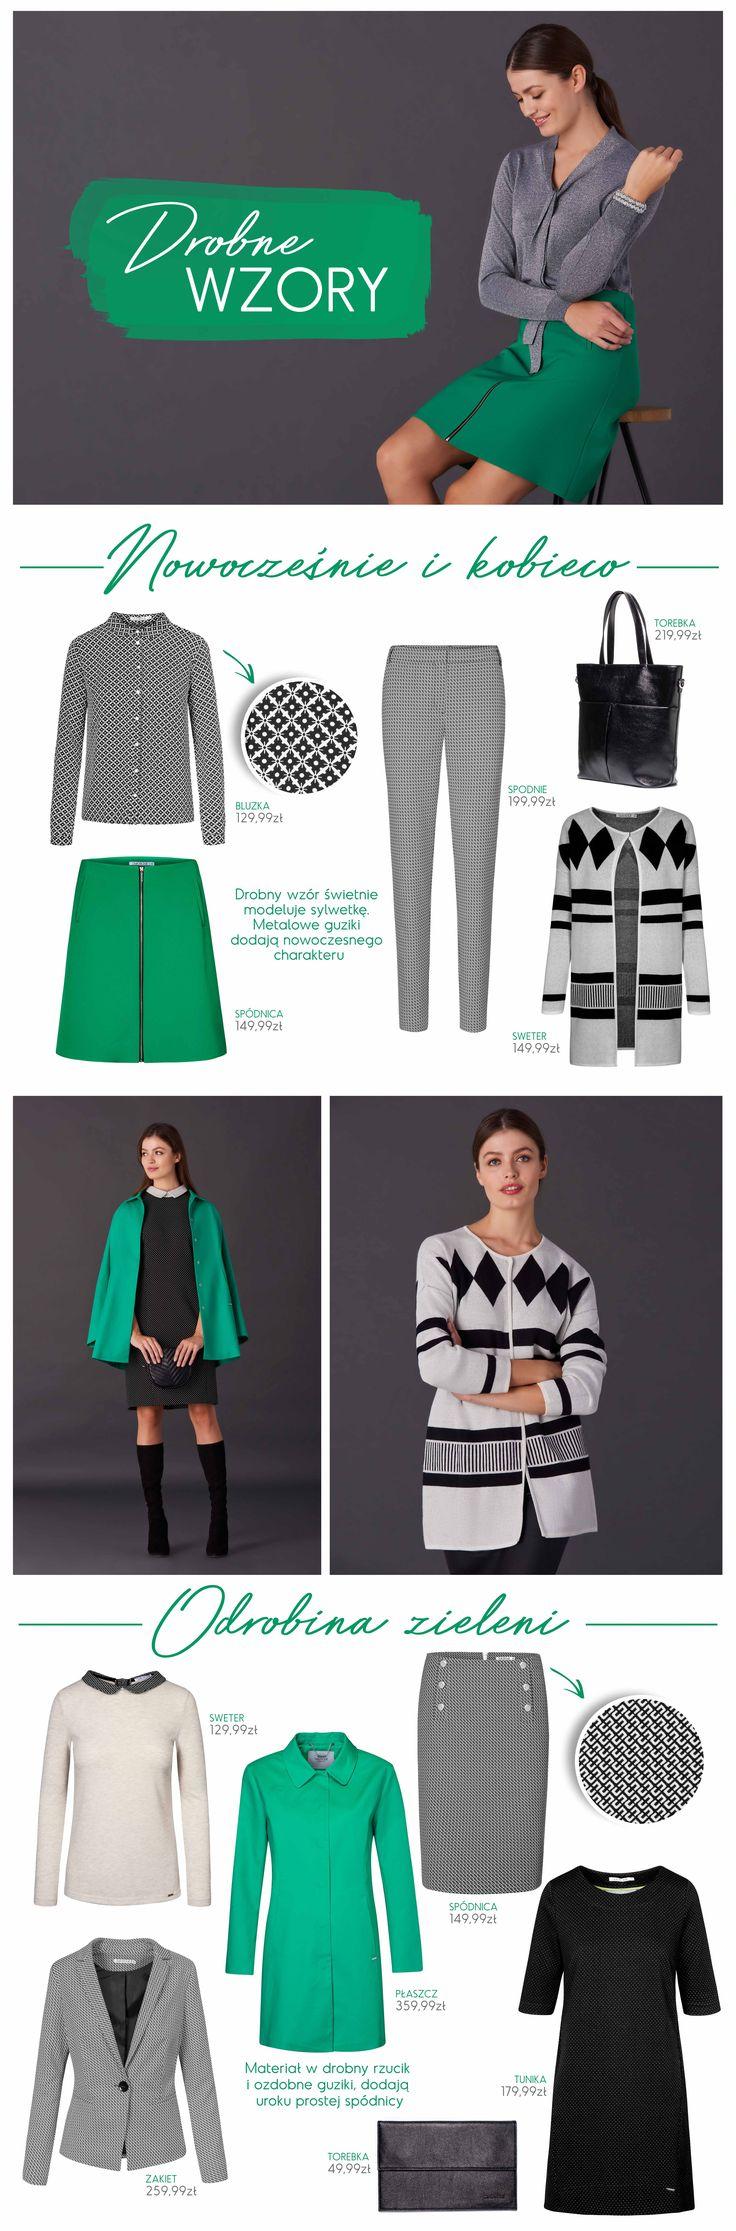 #quiosque #quiosquepl #naszainspiracja #ootd #collection #aw1617 #jesien #zima #woman #lady #style #outfit #ootd #feminine #kobieco #womanwear #trends #inspirations #fashion #polishfashion #polishbrand